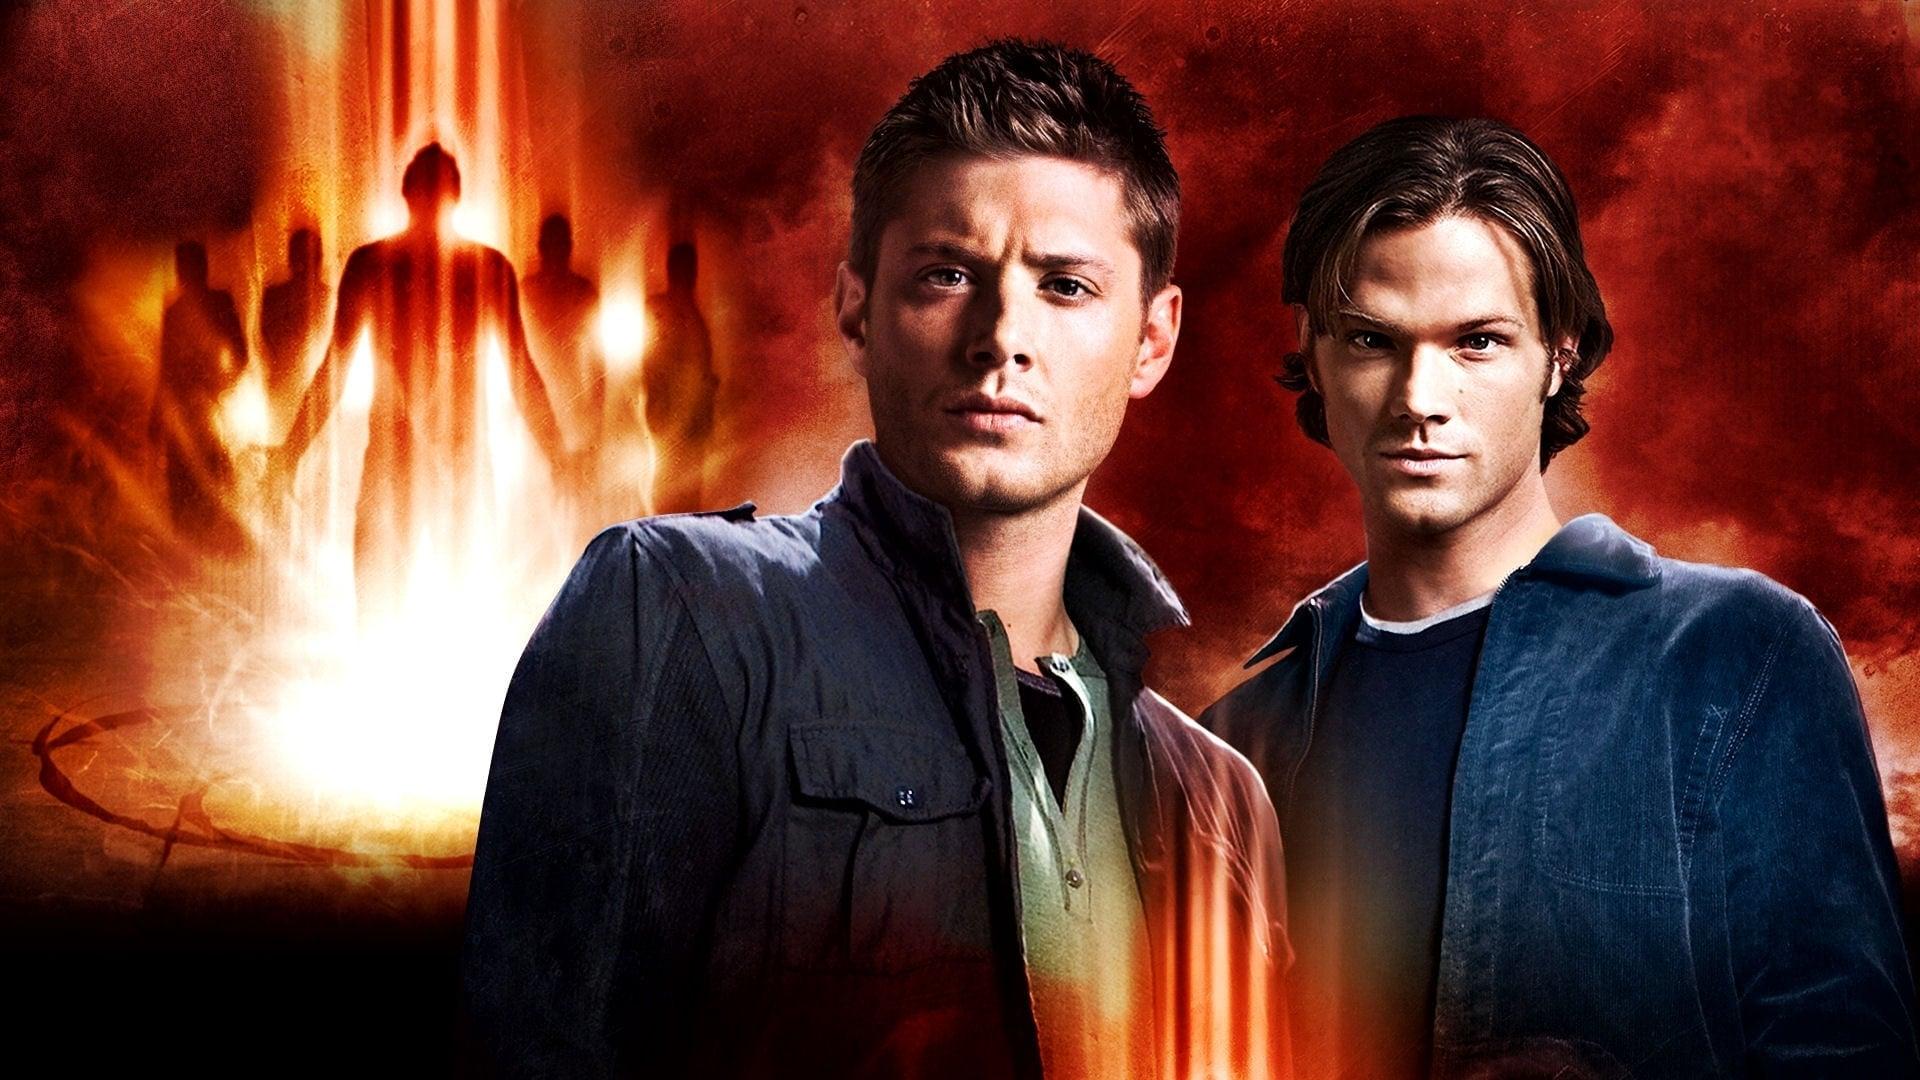 Supernatural - Season 1 Episode 13 Route 666